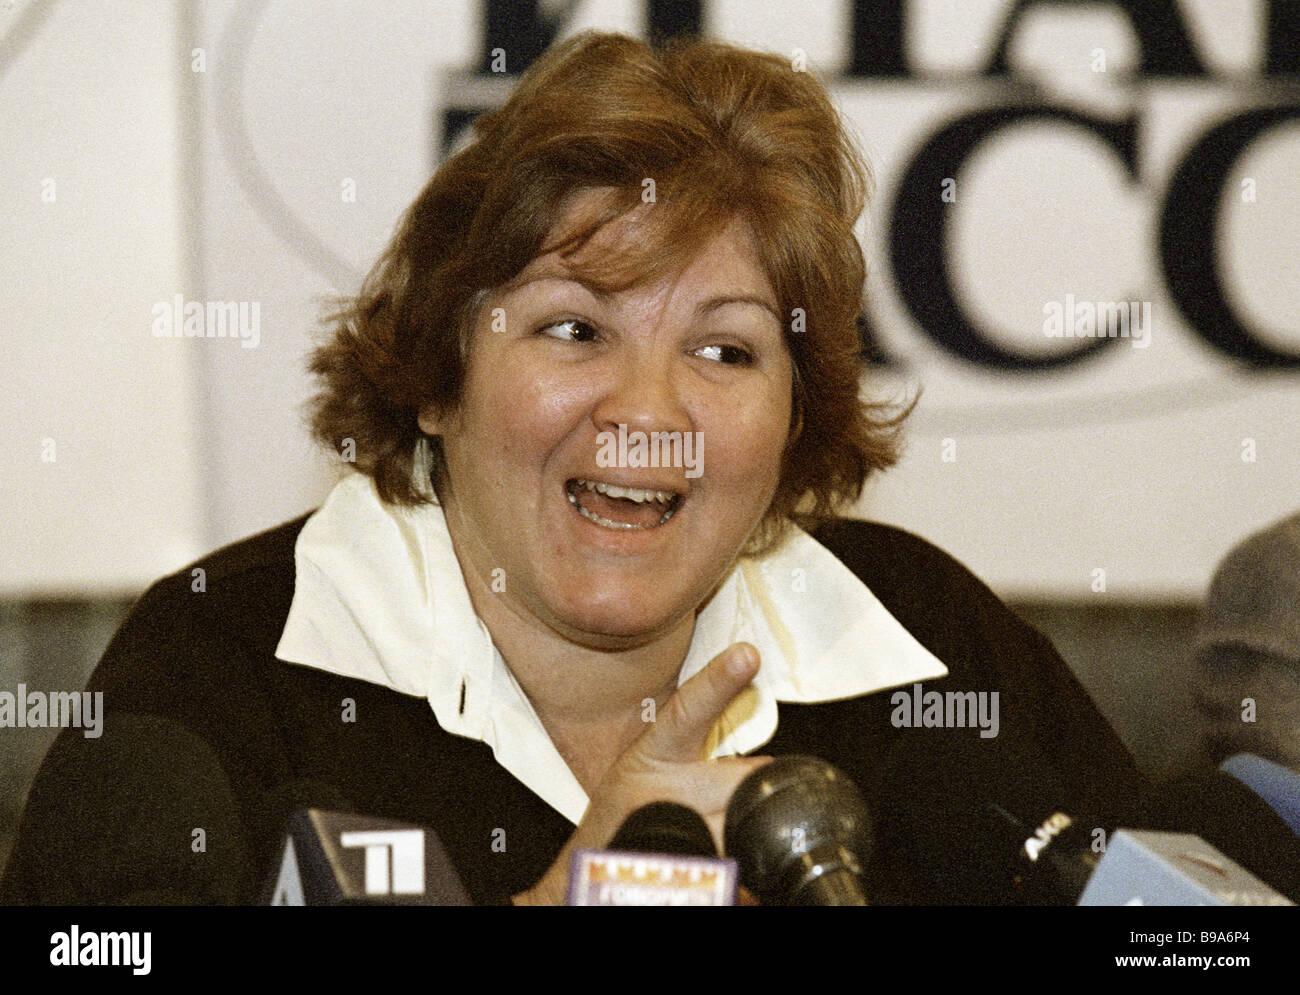 Daughter of Ernesto Che Guevara Aleida Guevara March at a news conference in ITAR TASS - Stock Image